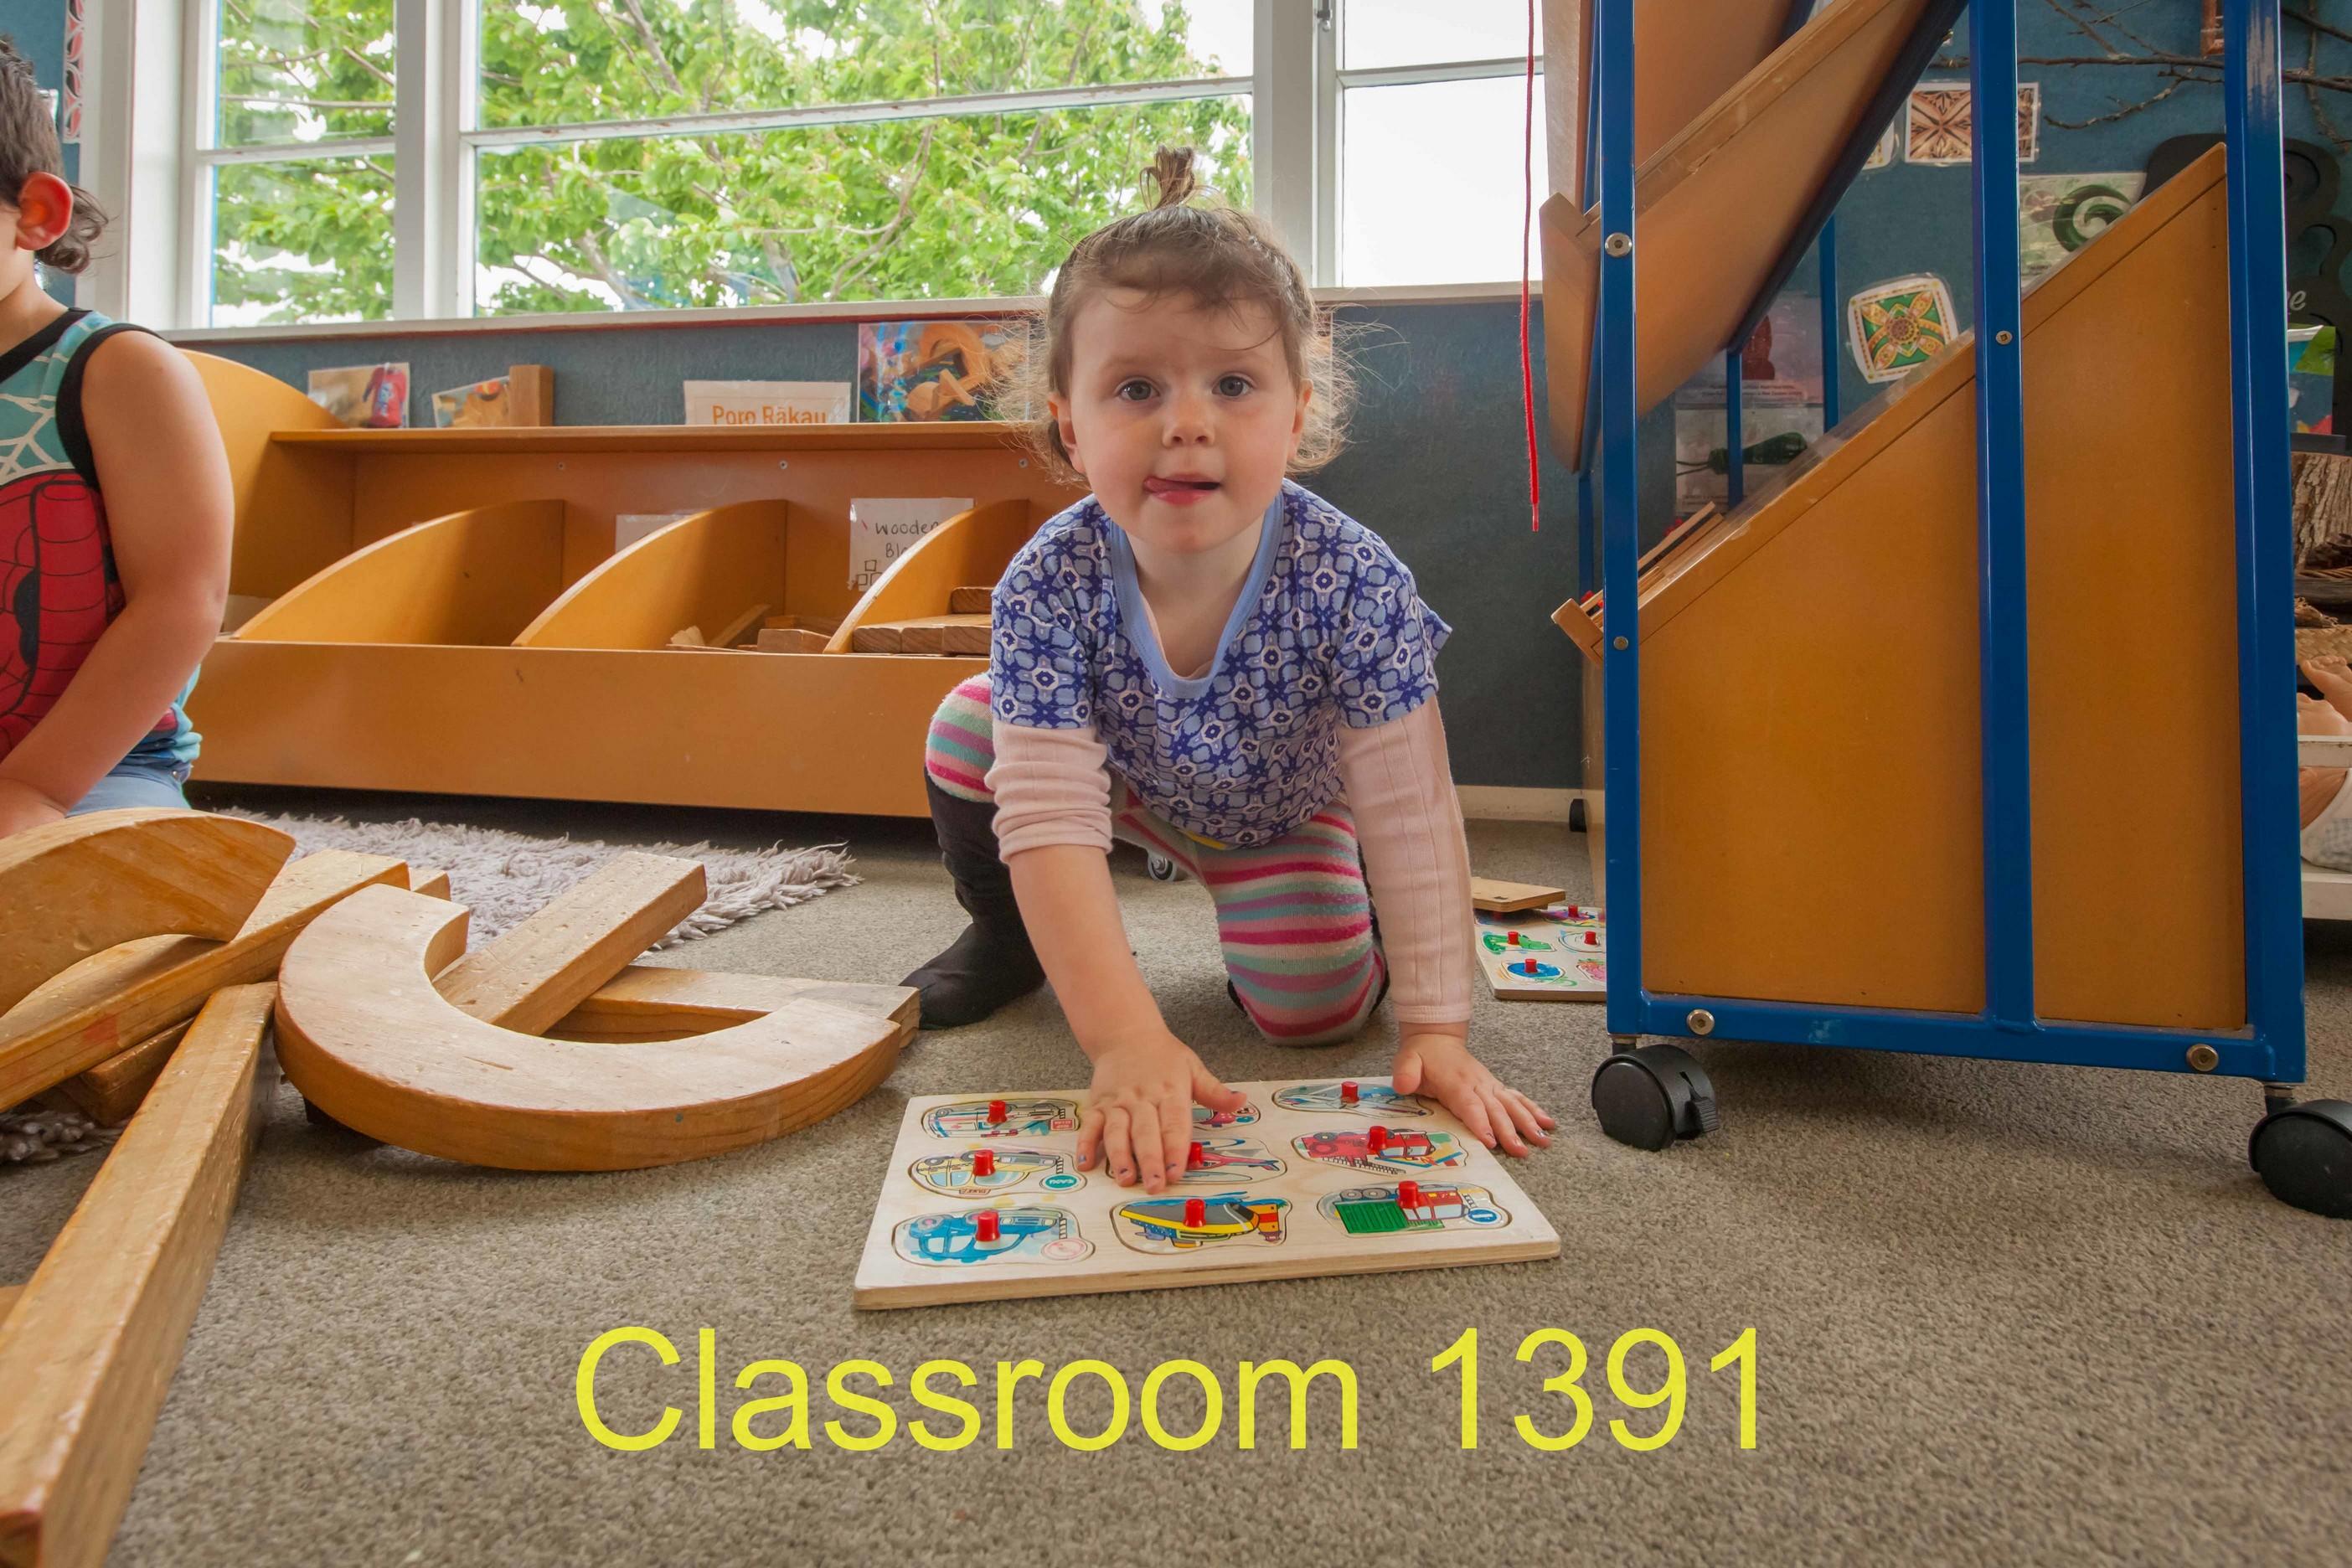 Classroom 1391